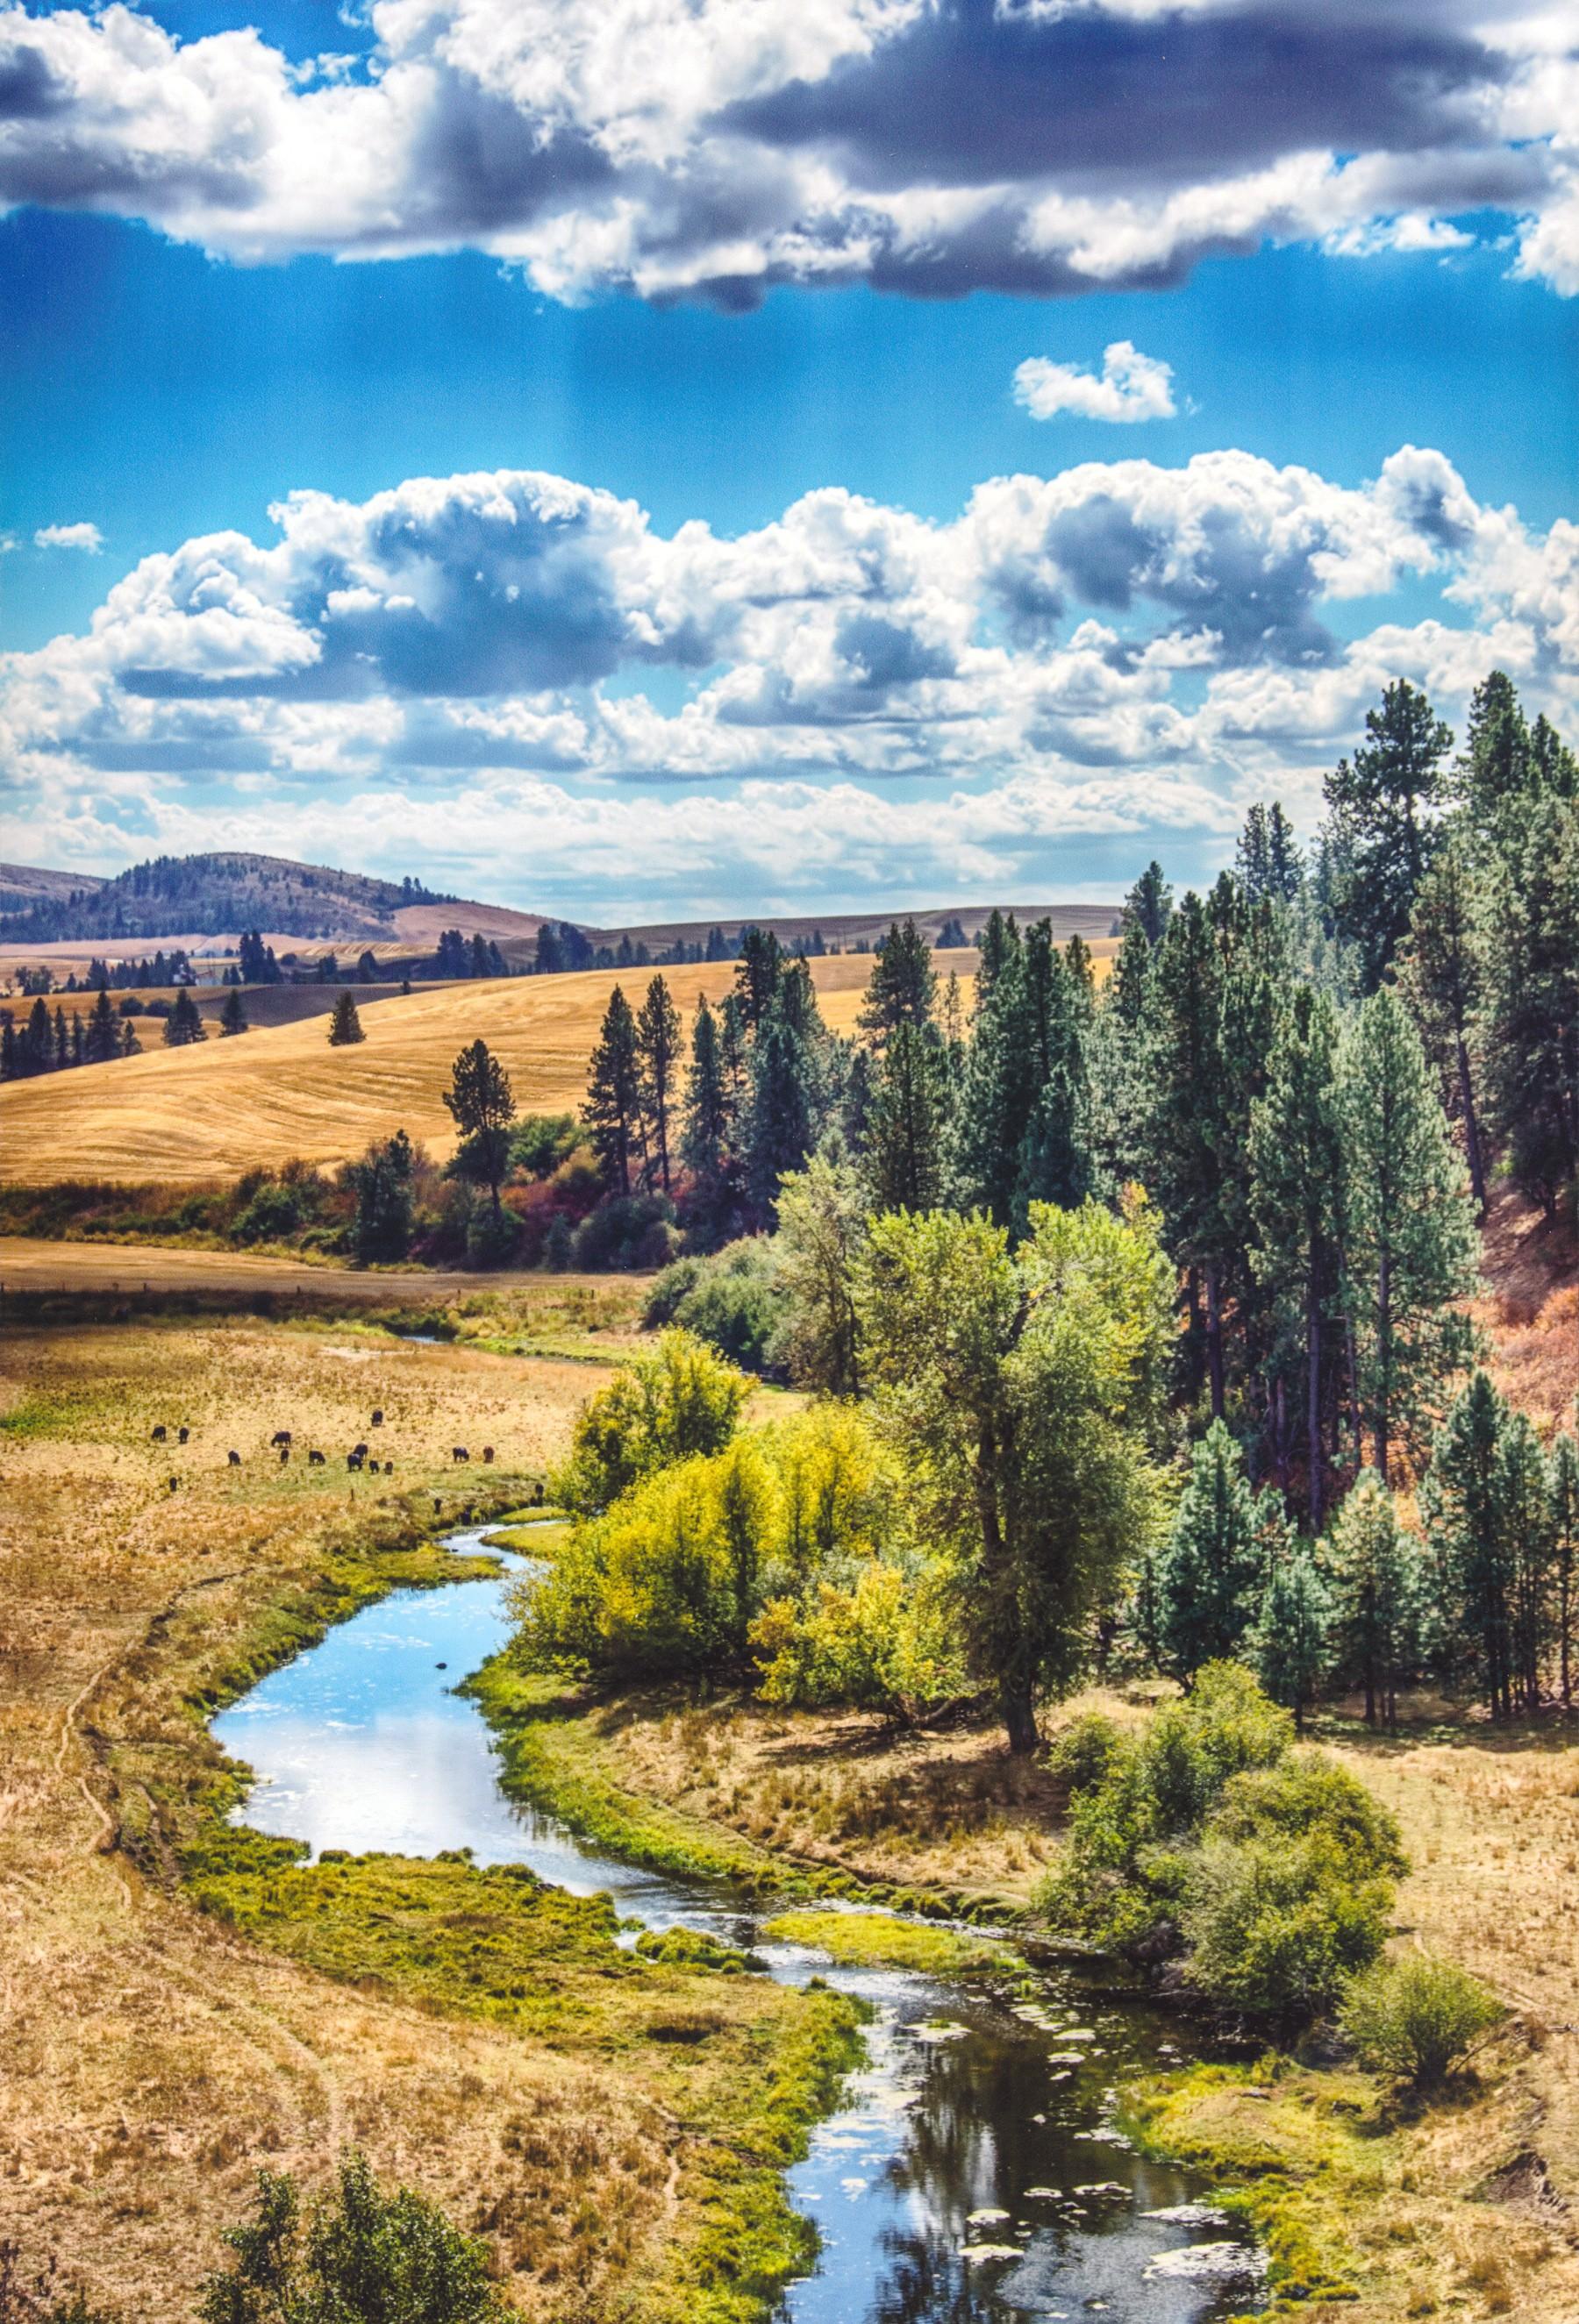 Chuck Browne - Lewiston, Idaho - 208-746-1506 - CHUCK BROWNE